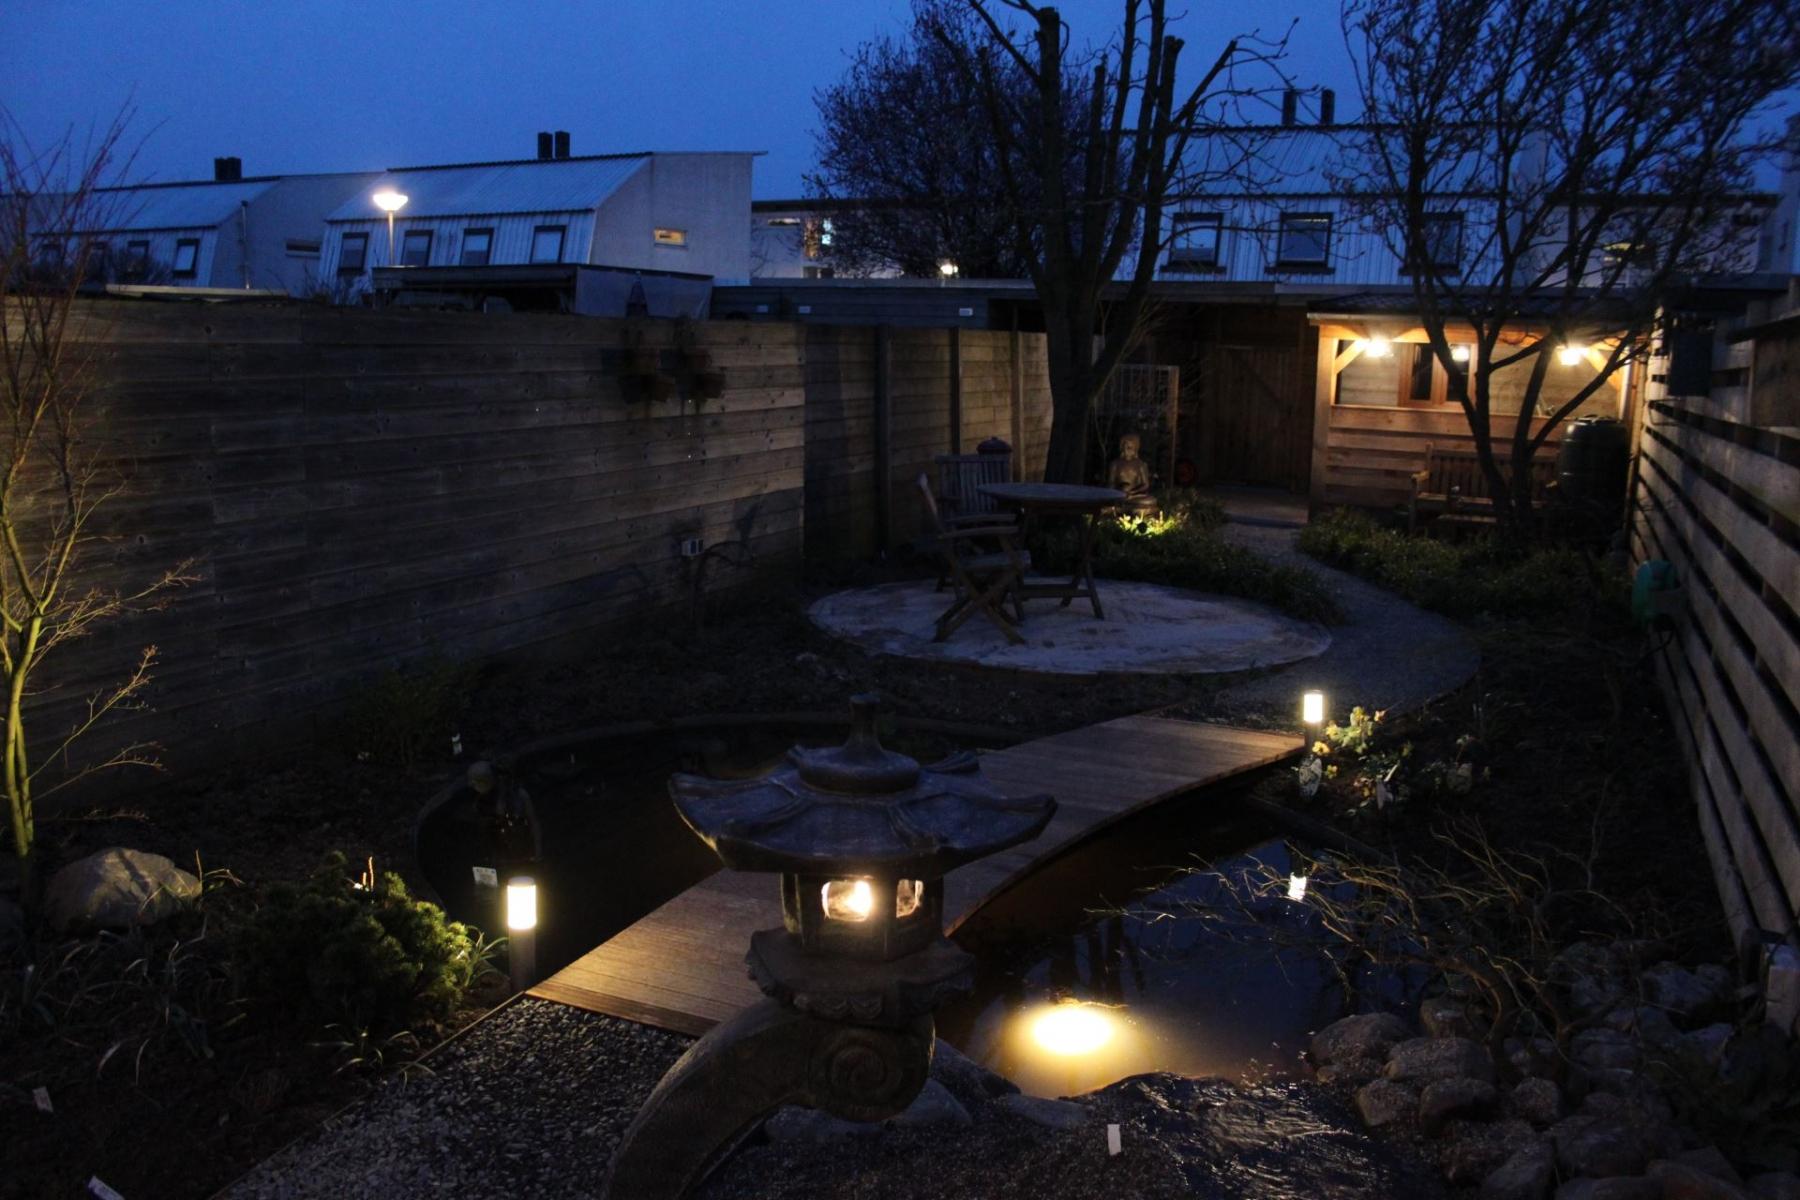 Hoveniersbedrijf Isidorus Hoeve Miniparadijsje tuin